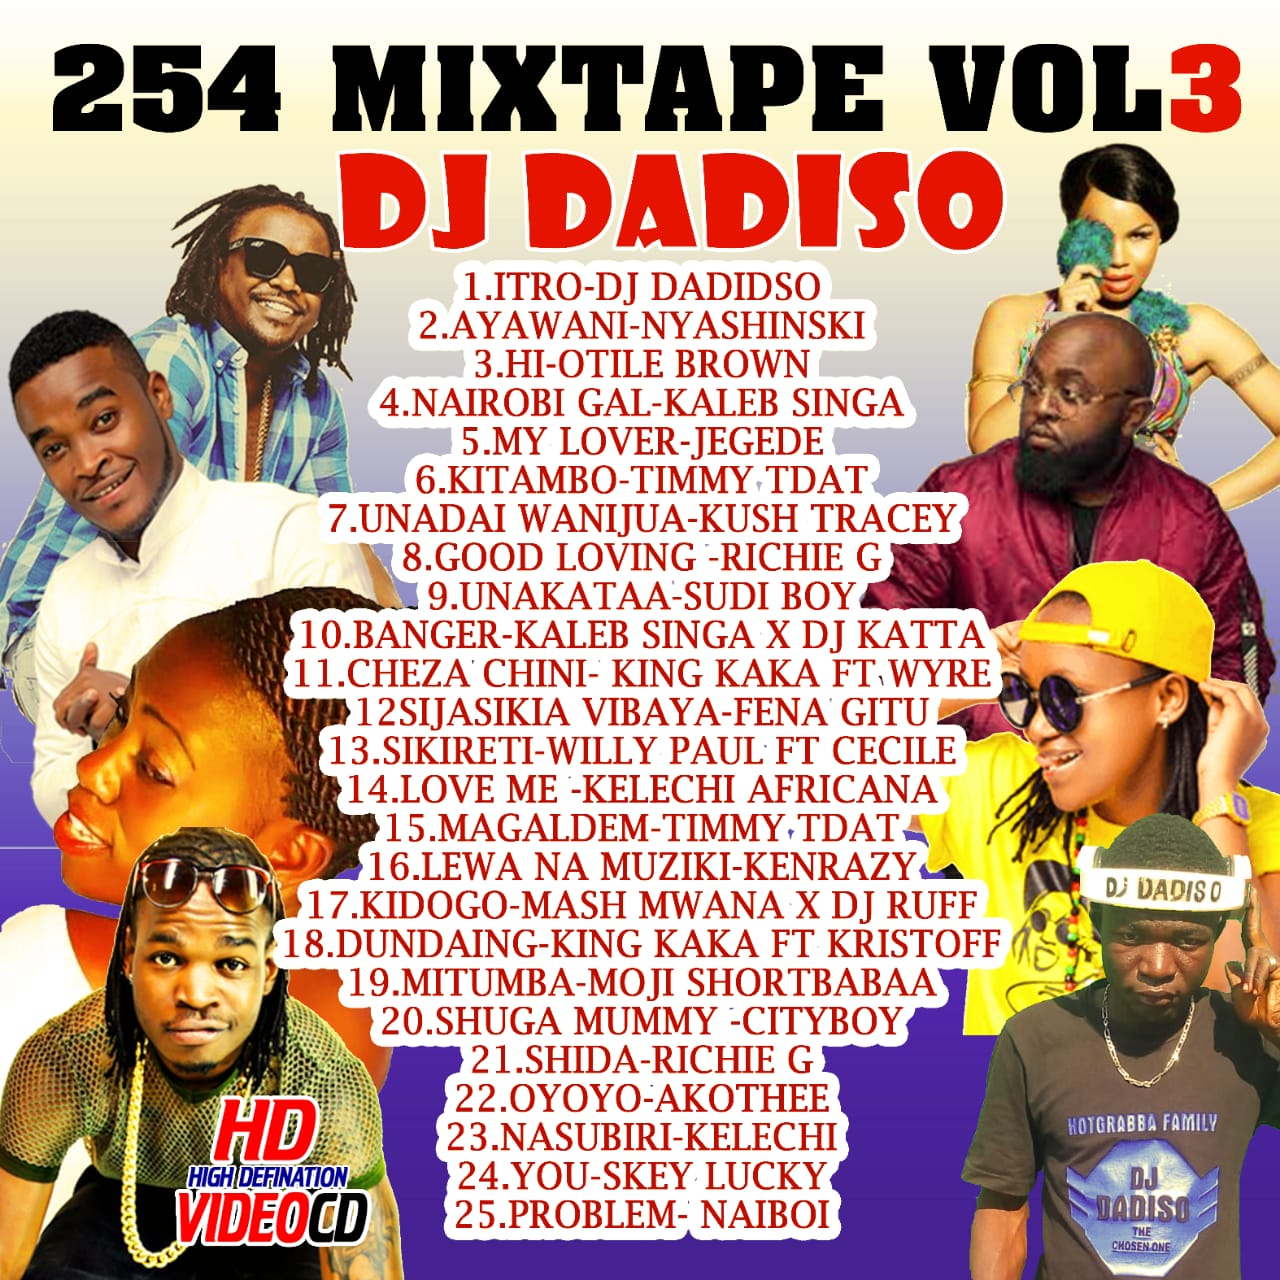 DJ Dadiso - 254 Mixtape Vol 3 (Best of Kenyan Music Mix 2019